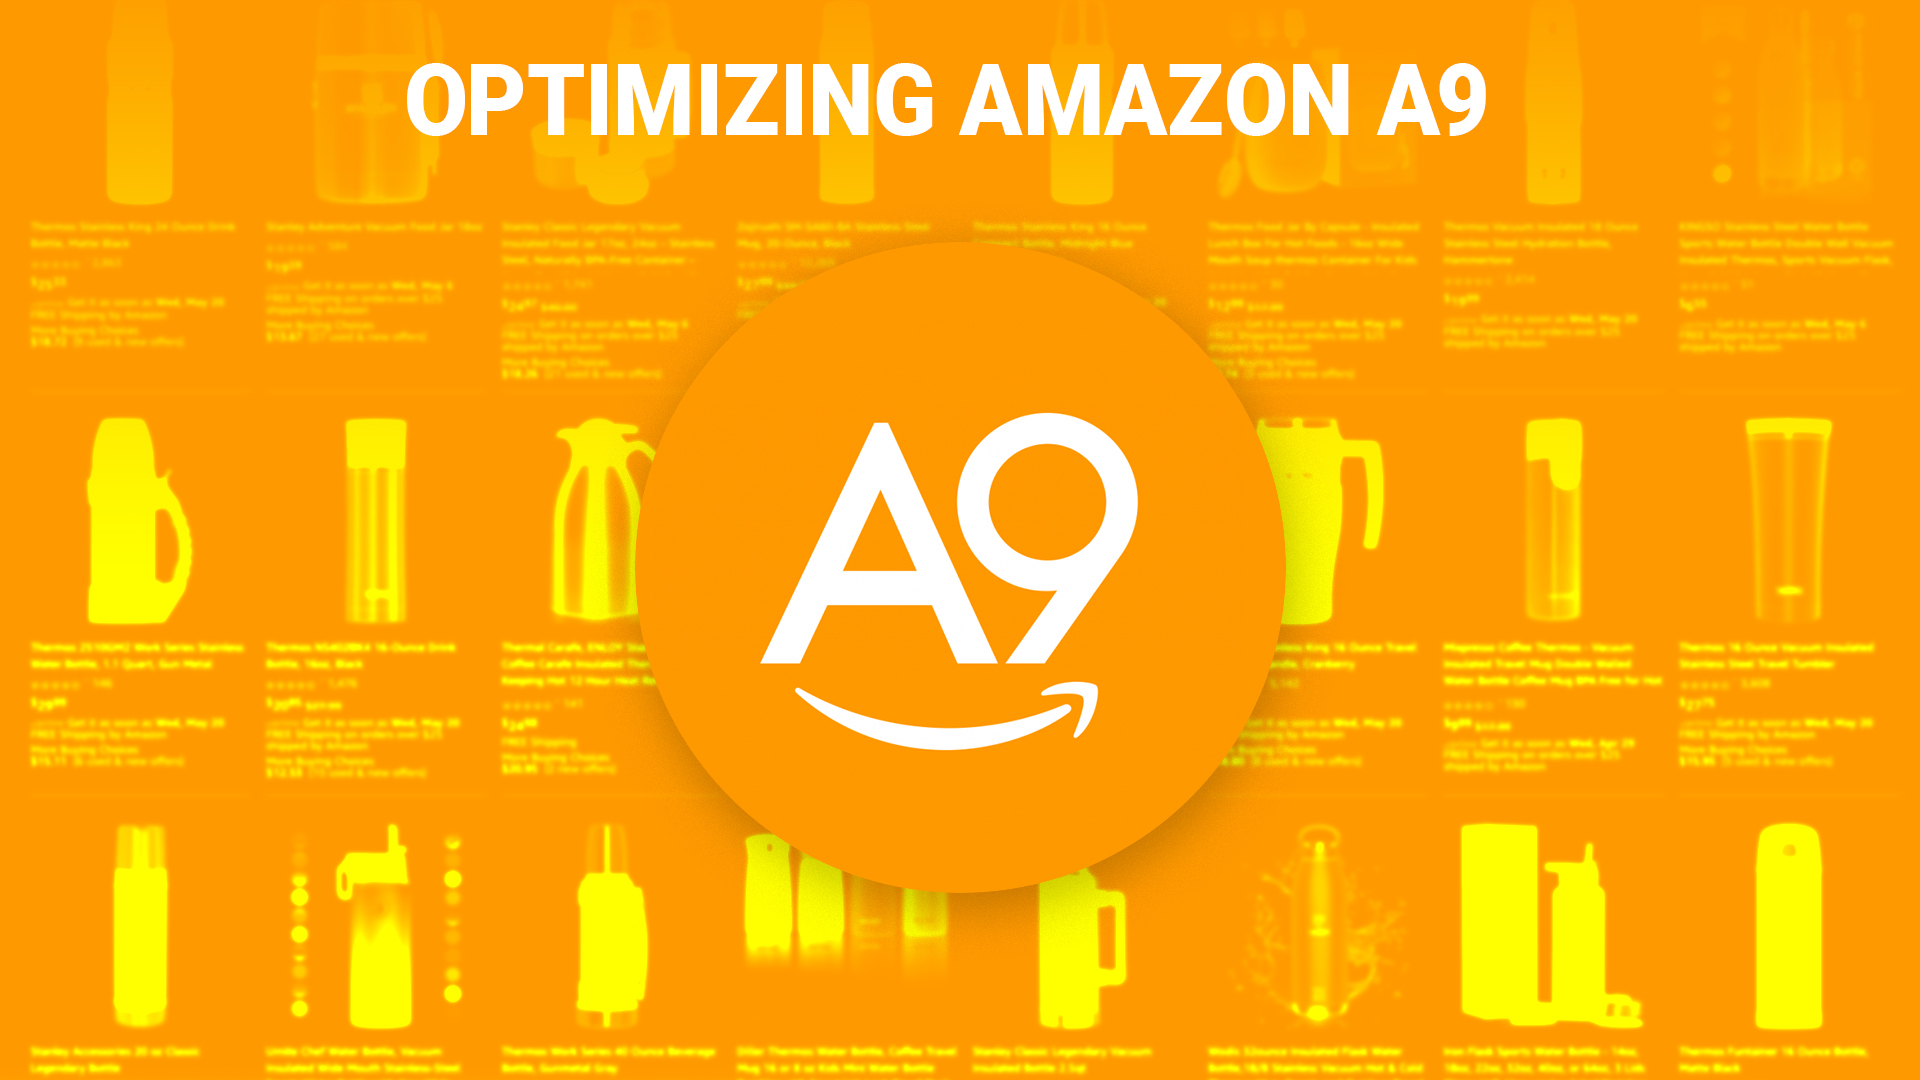 SEO for Amazon Sellers: Optimizing Amazon A9